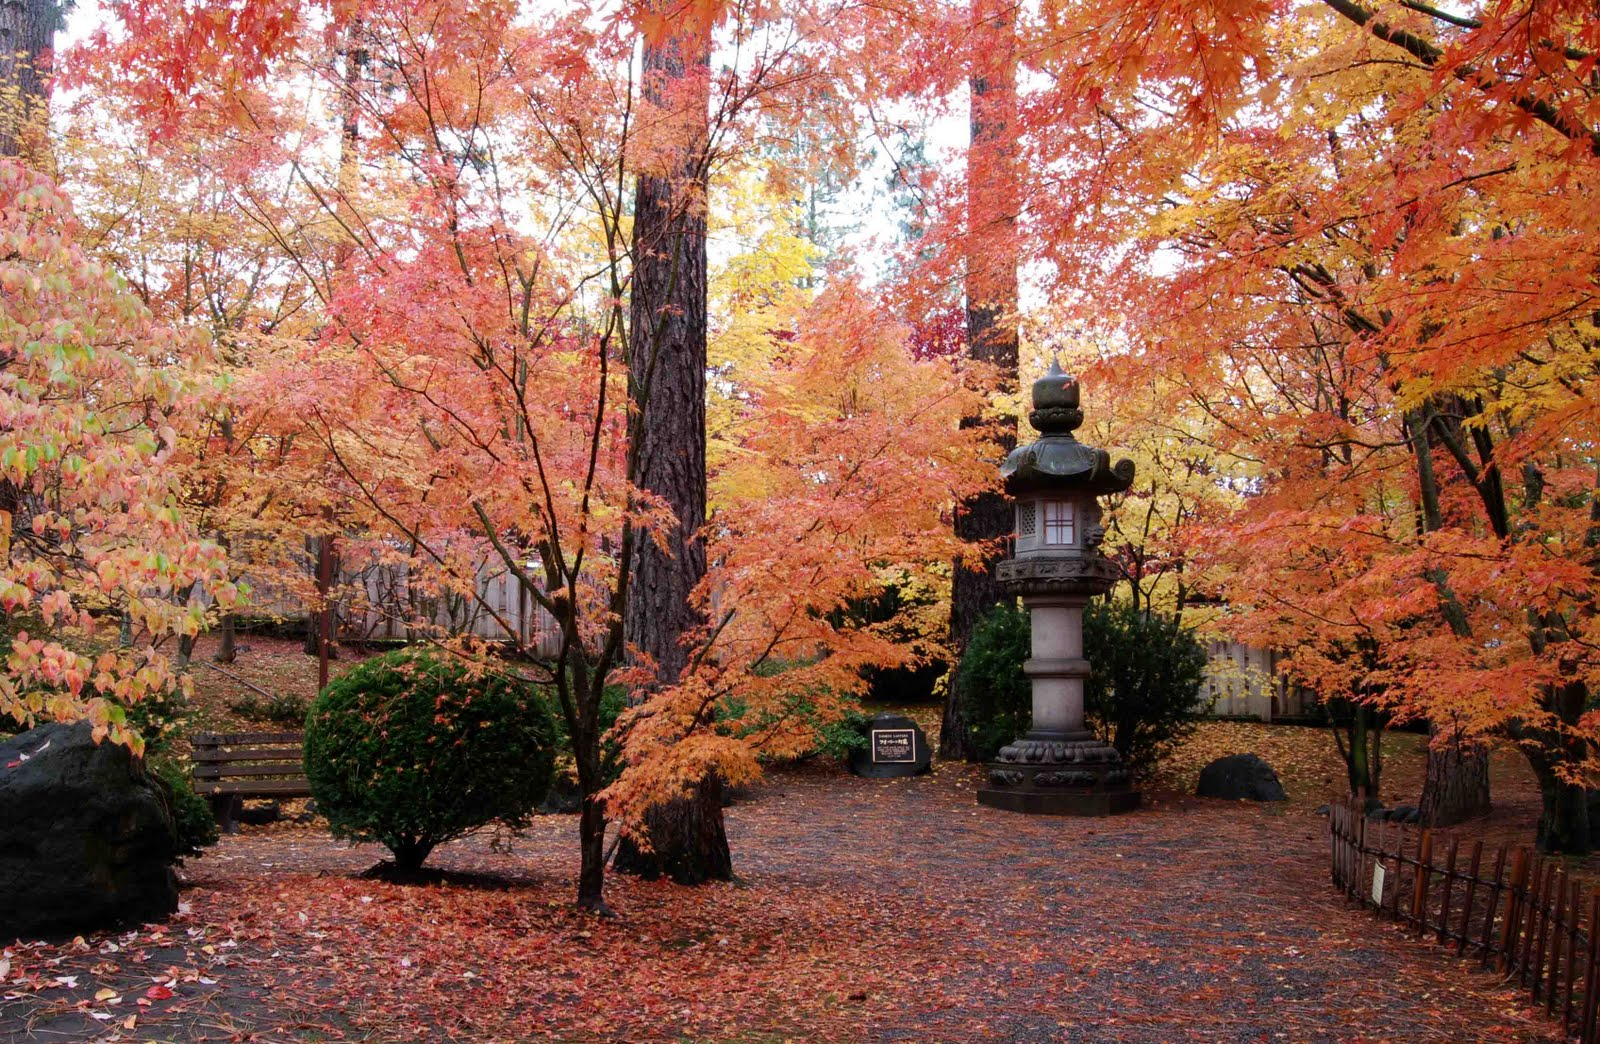 Brian Backus Blog October 31 2020 Nishinomiya Tsutakawa Japanese Garden Manito Park Spokane